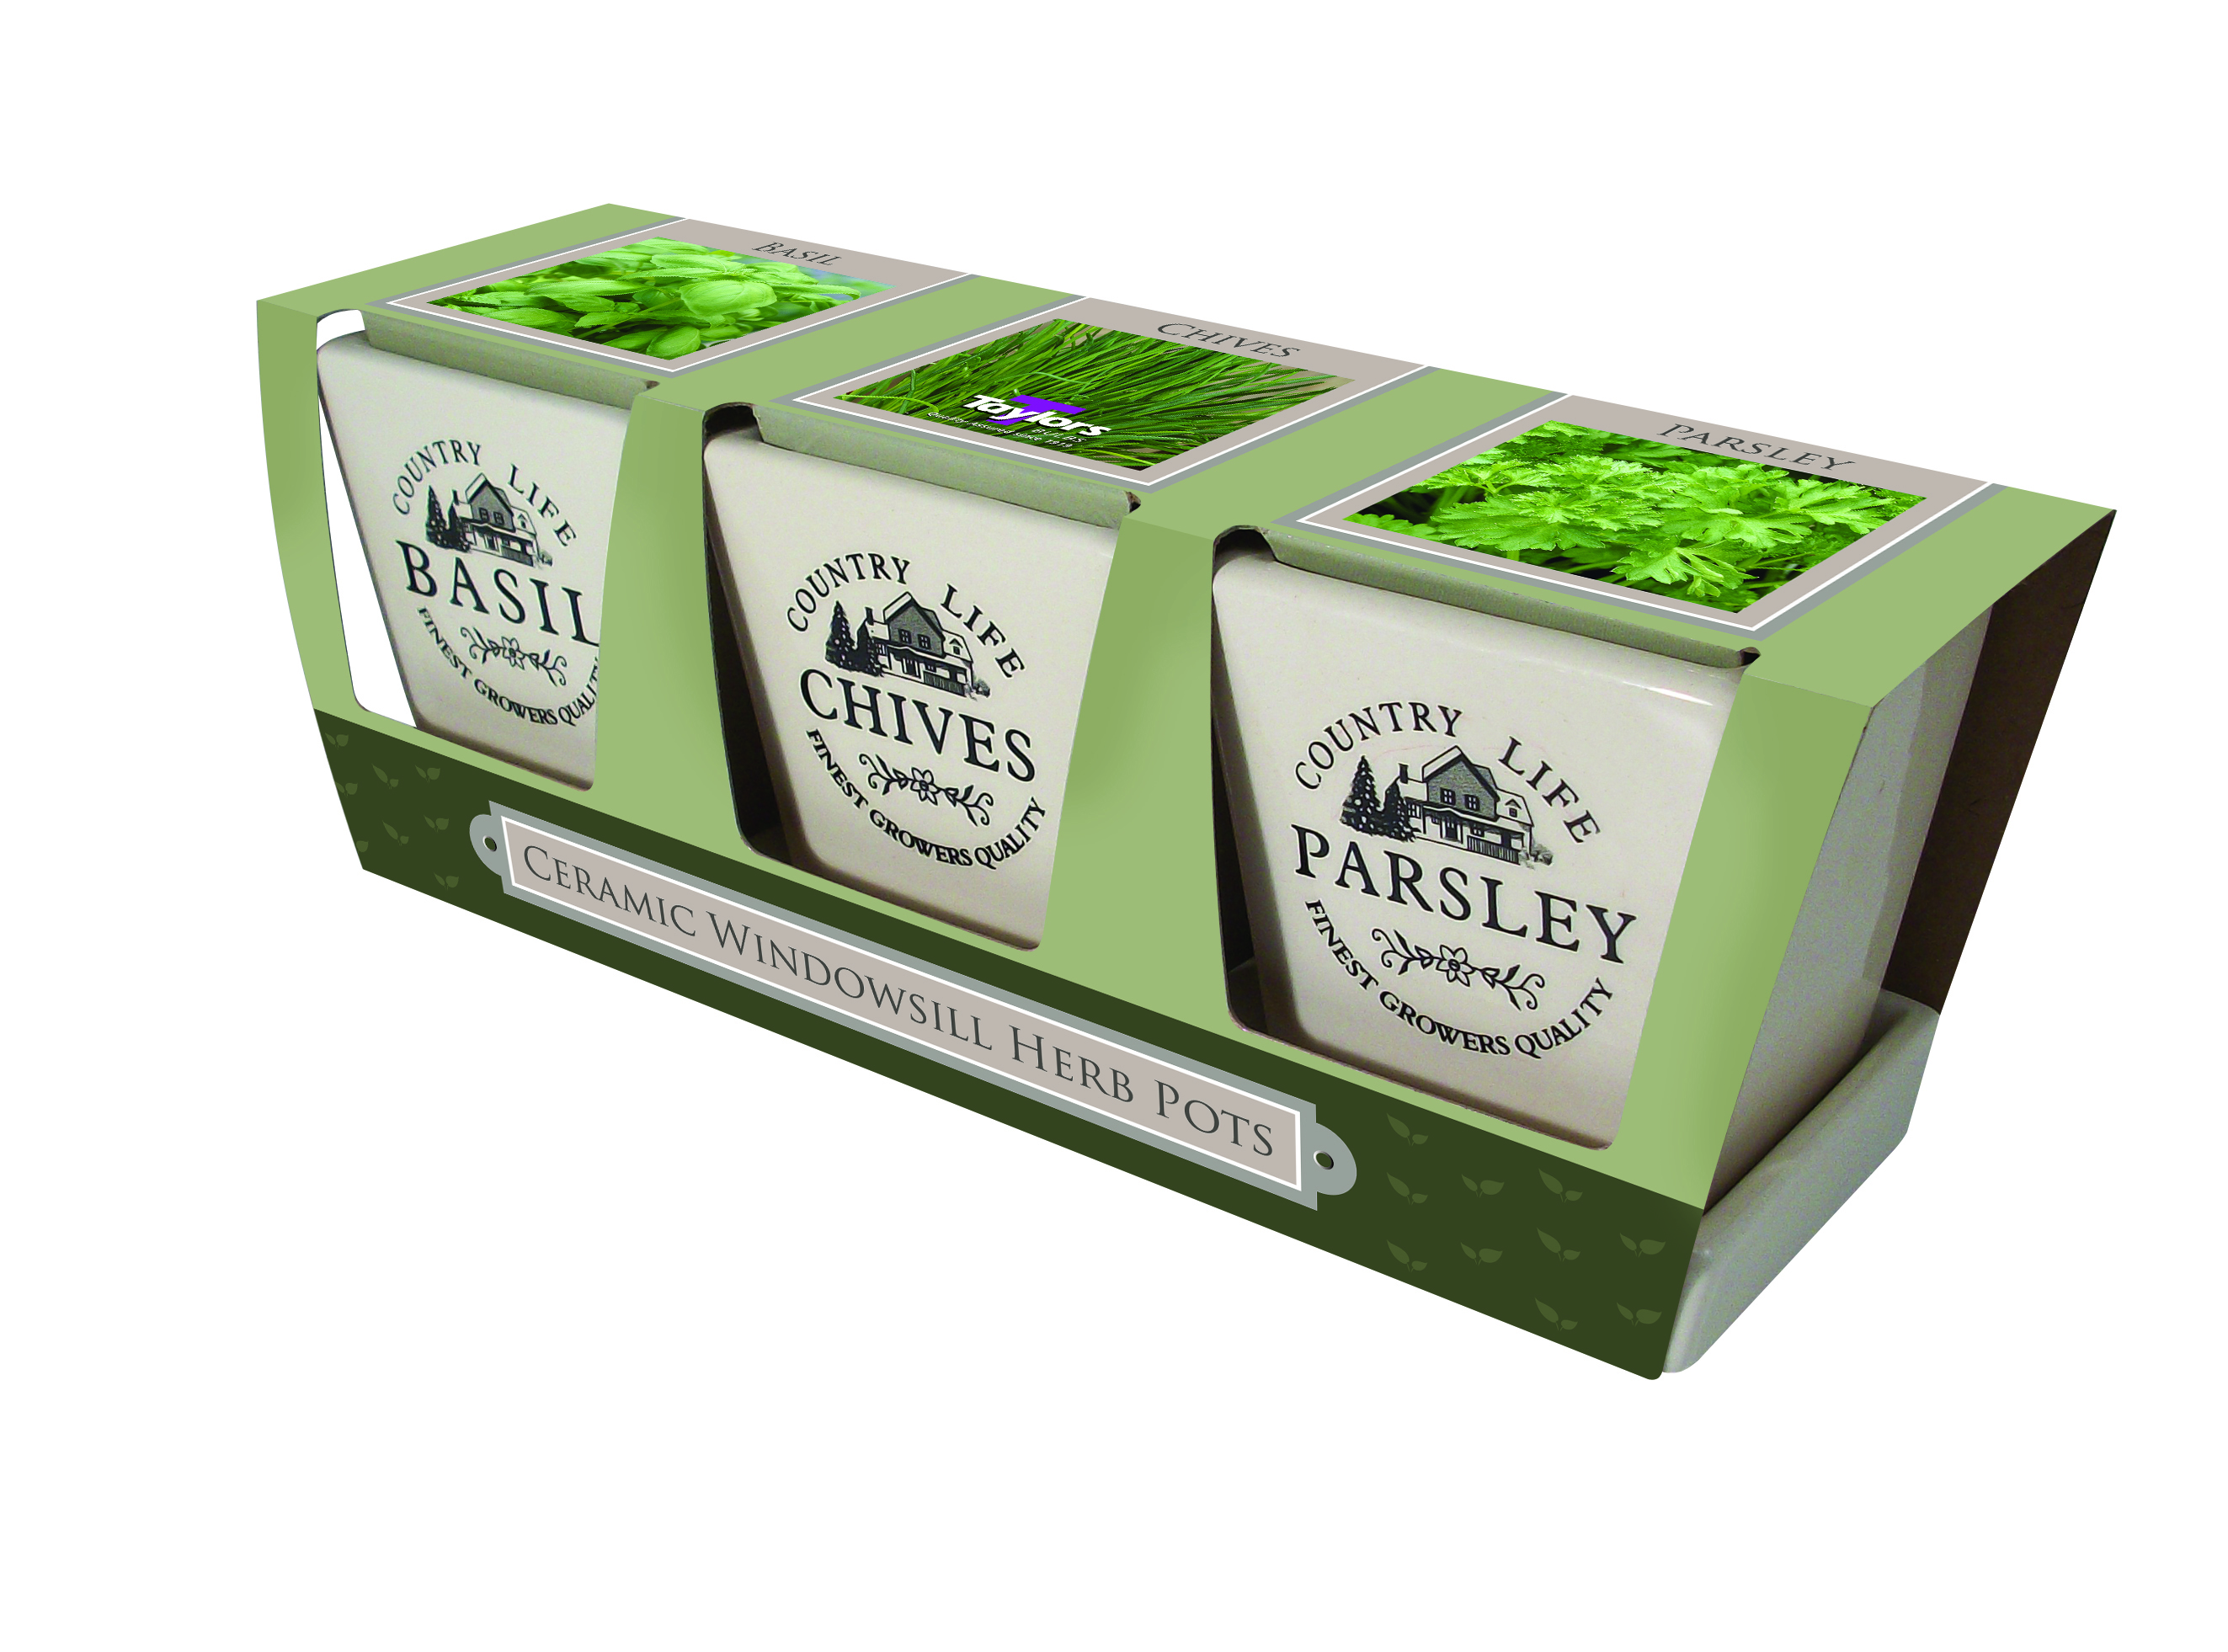 Taylors Ceramic Windowsill Herb Kit pots, compost \u0026 seeds parsley, chives, basil